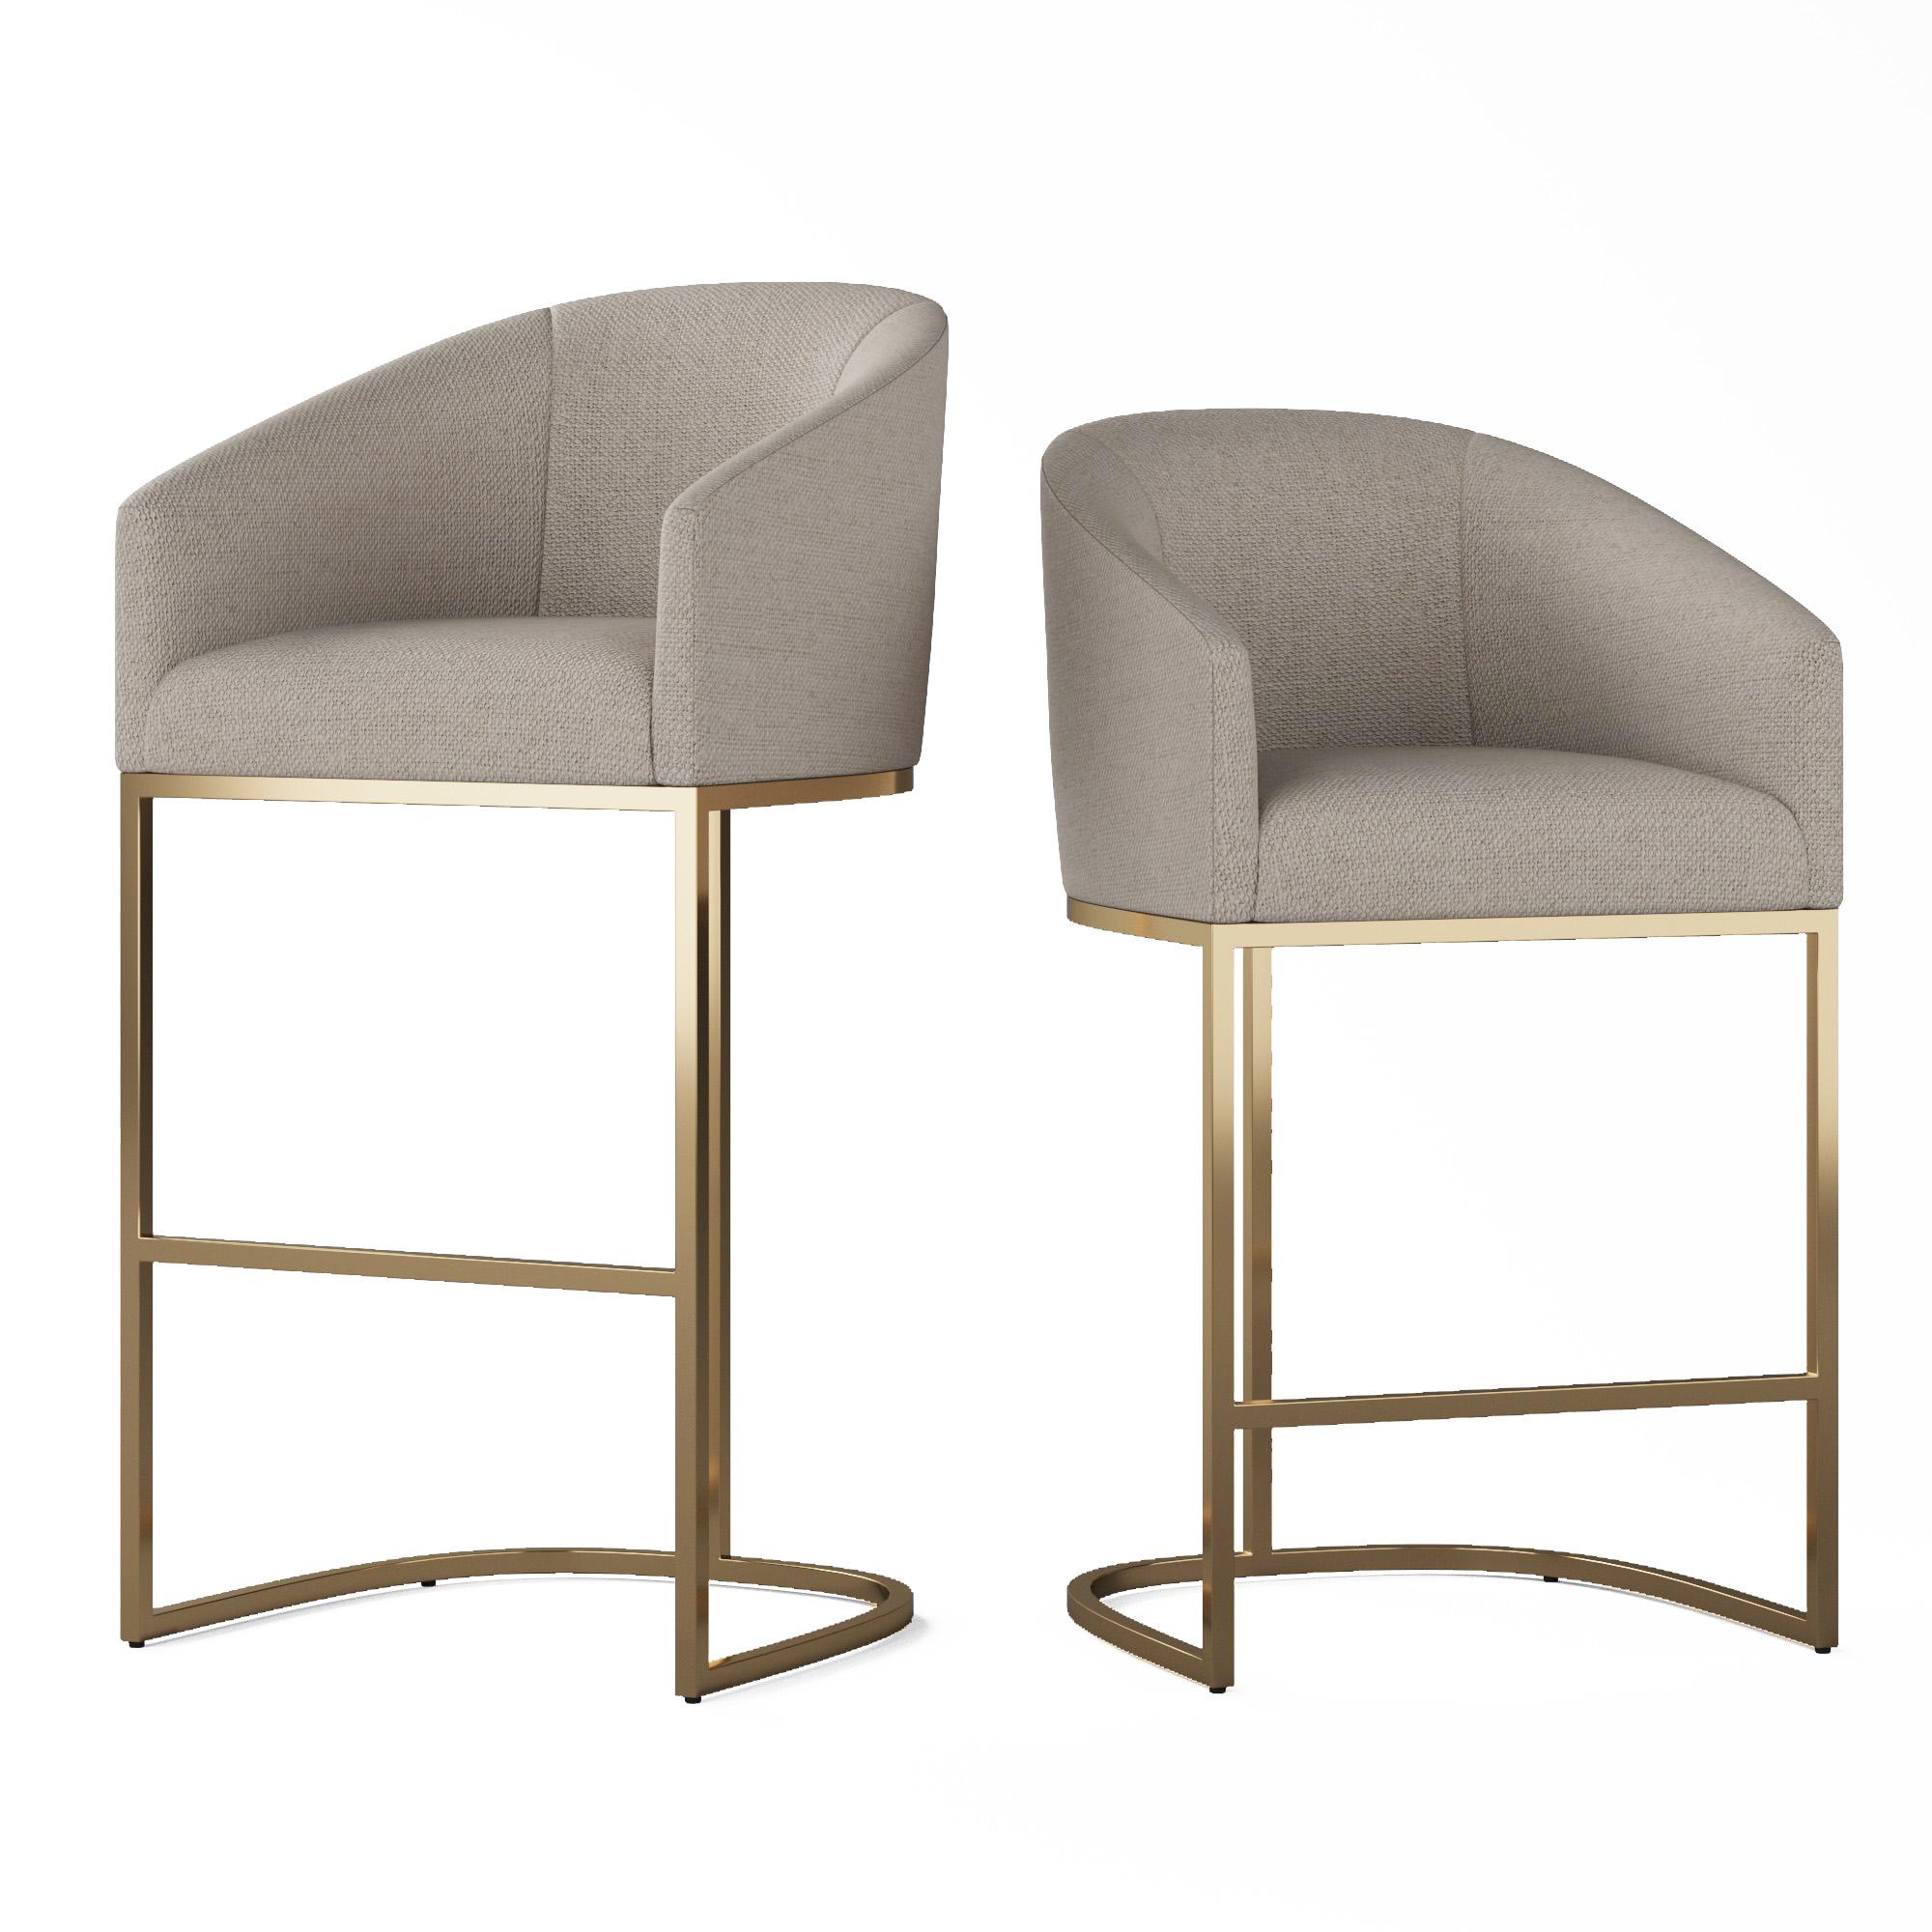 Peachy Rh Emery Barrelback Slope Fabric Stool Machost Co Dining Chair Design Ideas Machostcouk